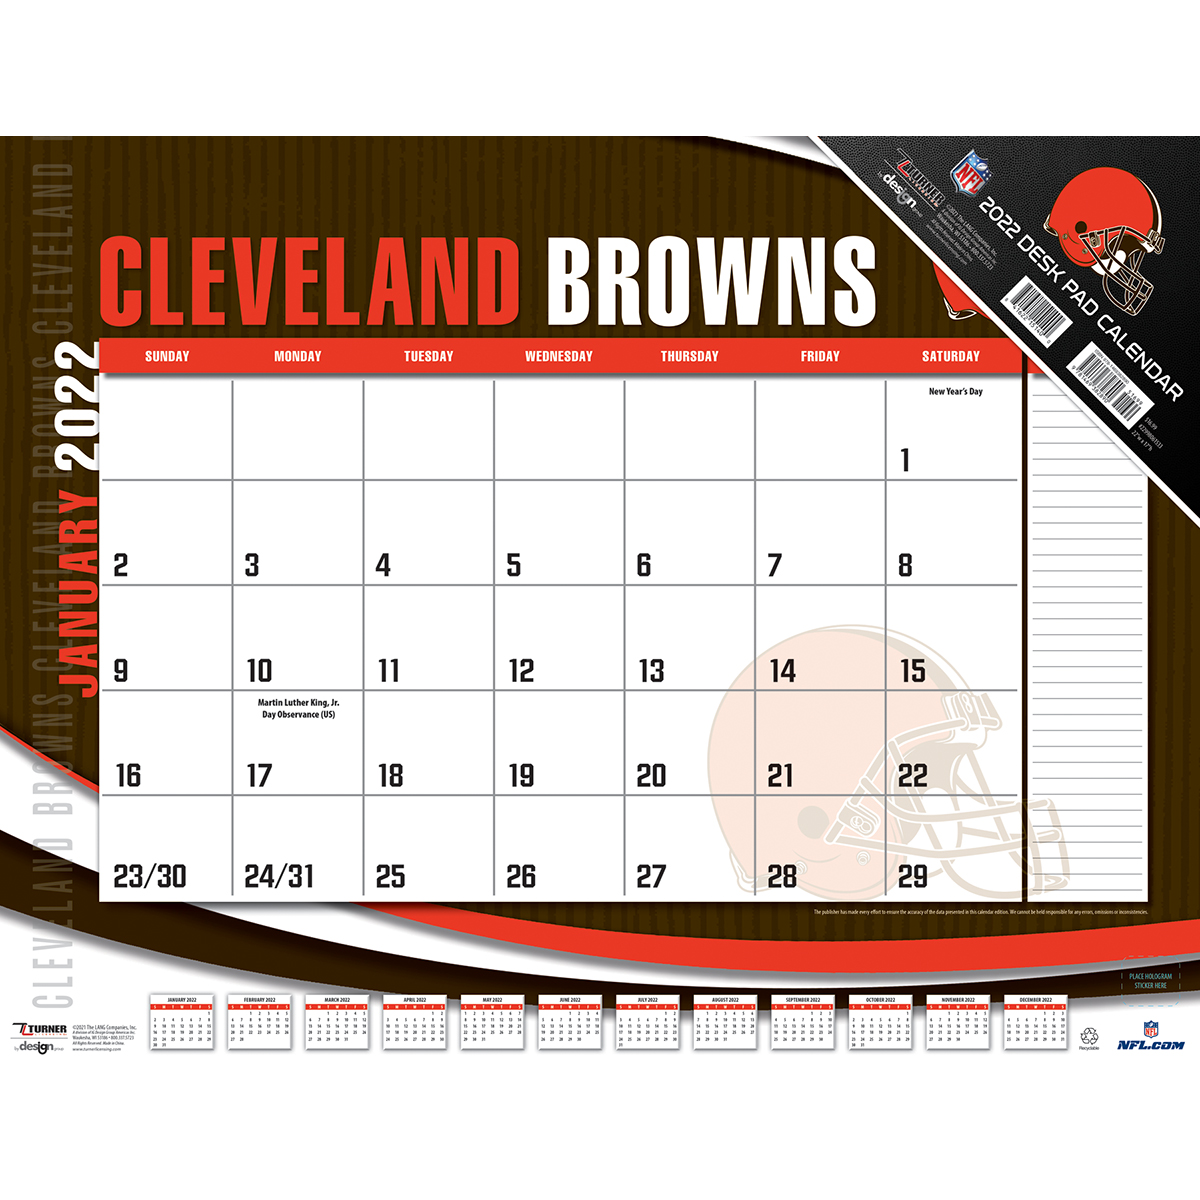 Browns Schedule 2020.Cleveland Browns 2020 Nfl 22 X 17 Desk Calendar Buy At Khc Sports